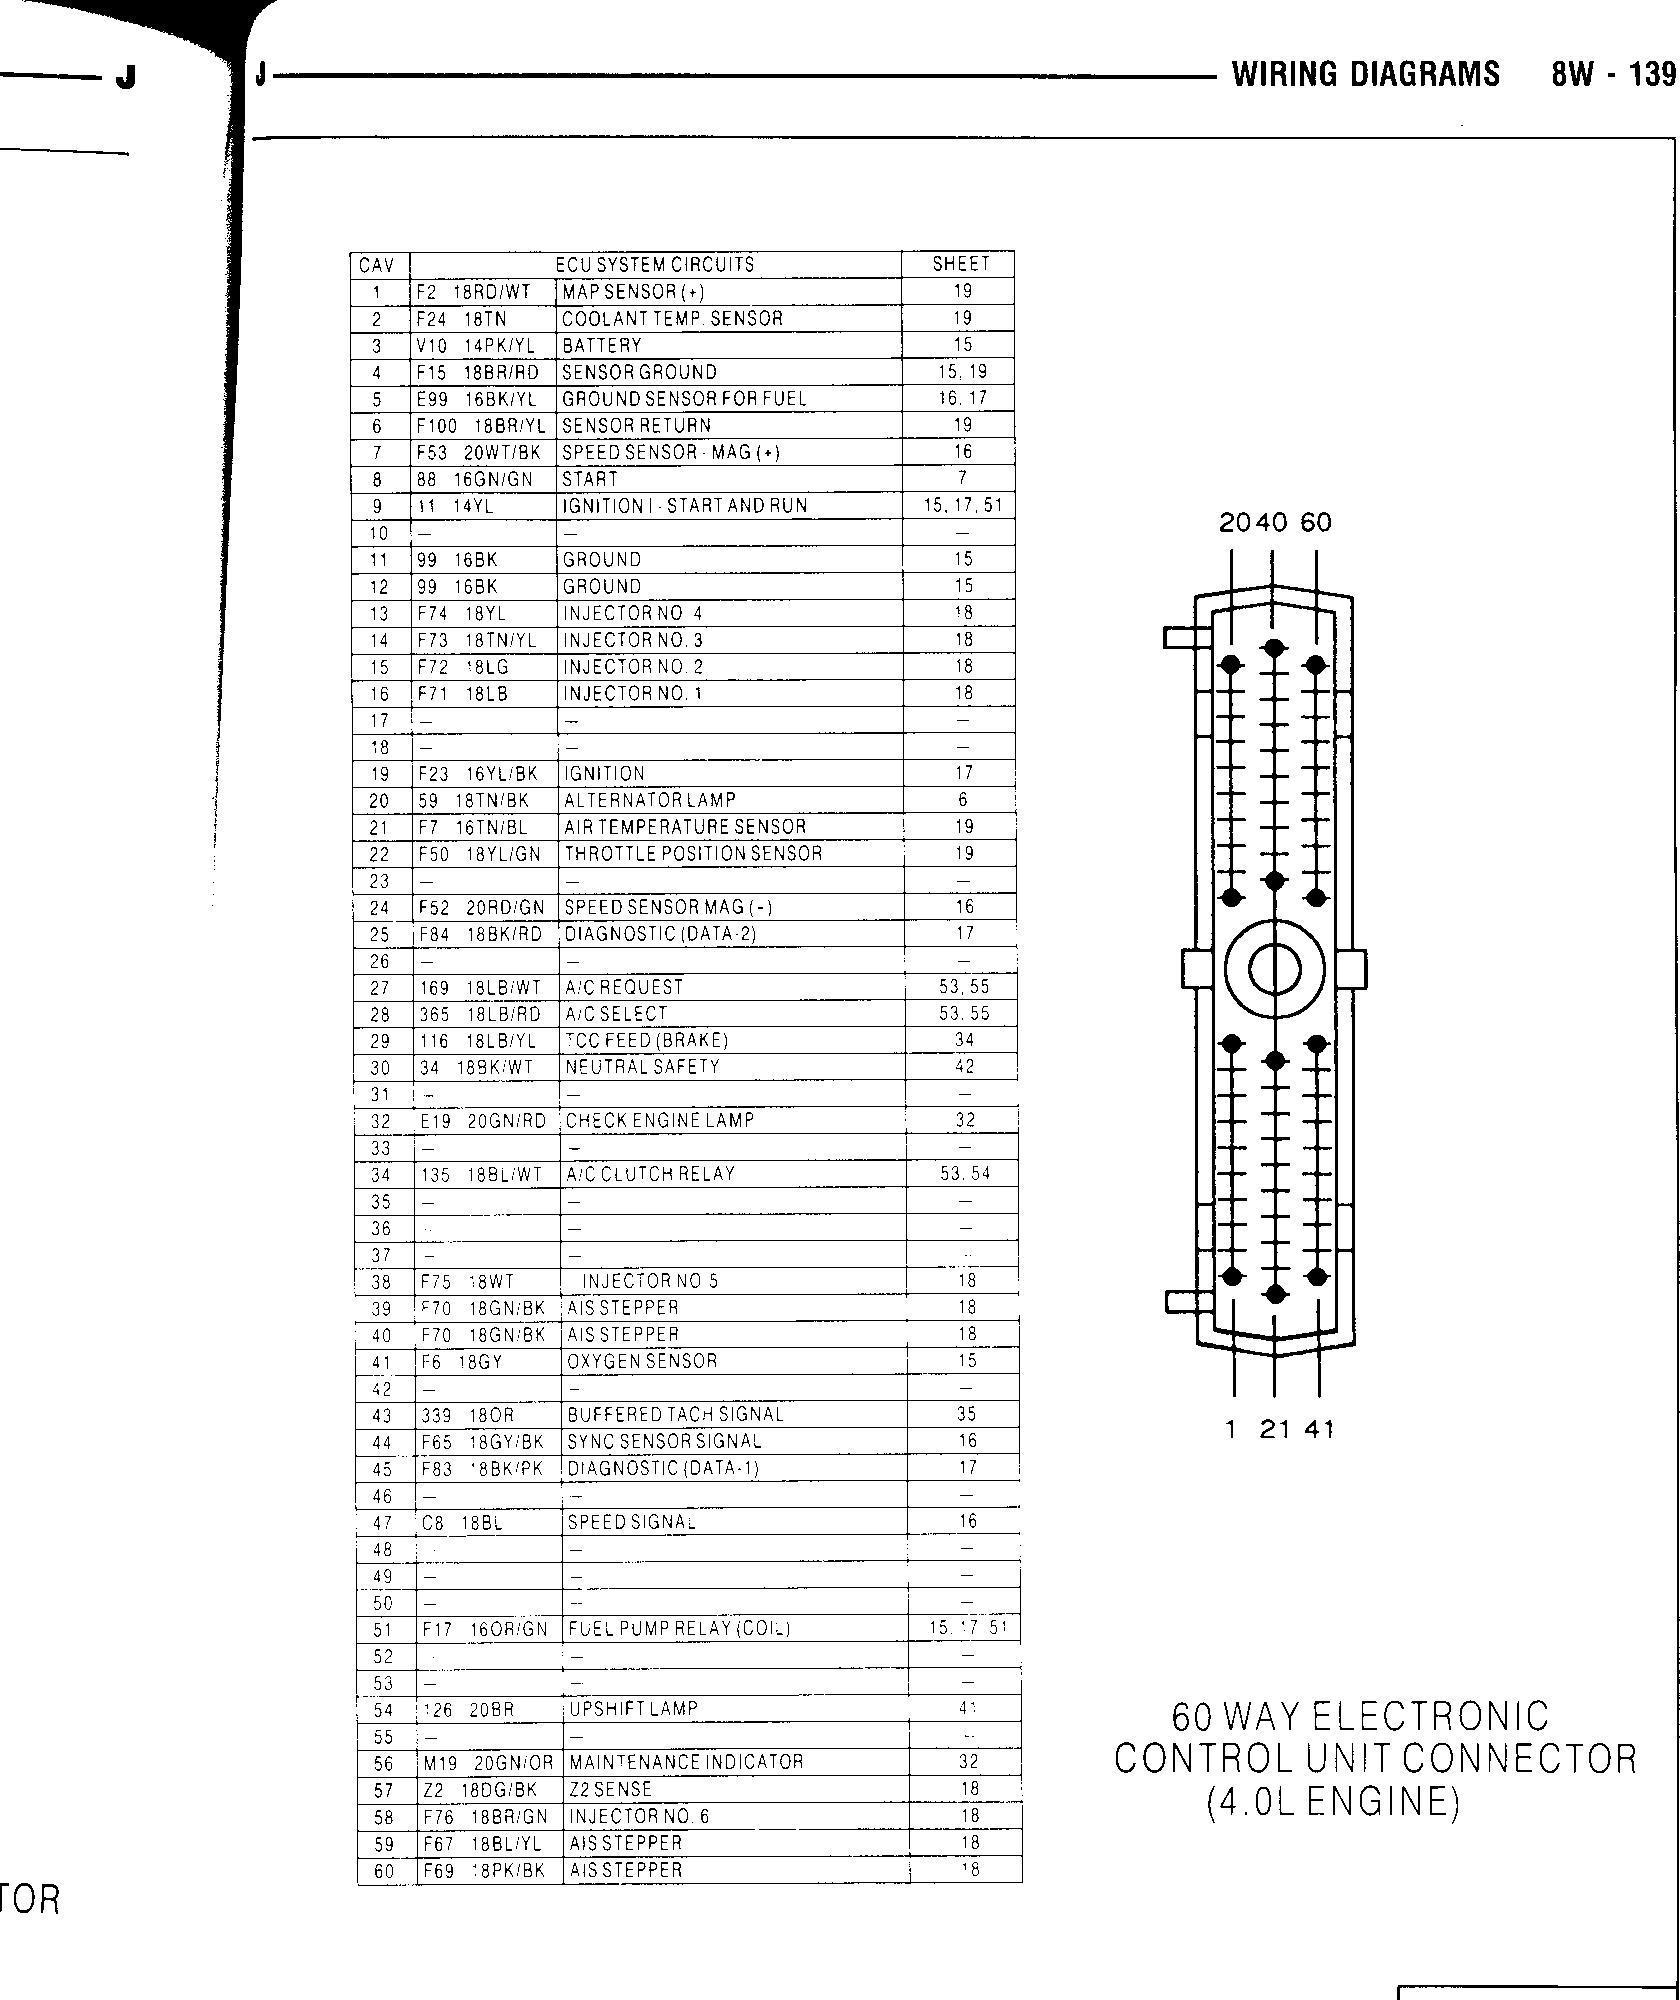 4.0l-ecu-connector.jpg